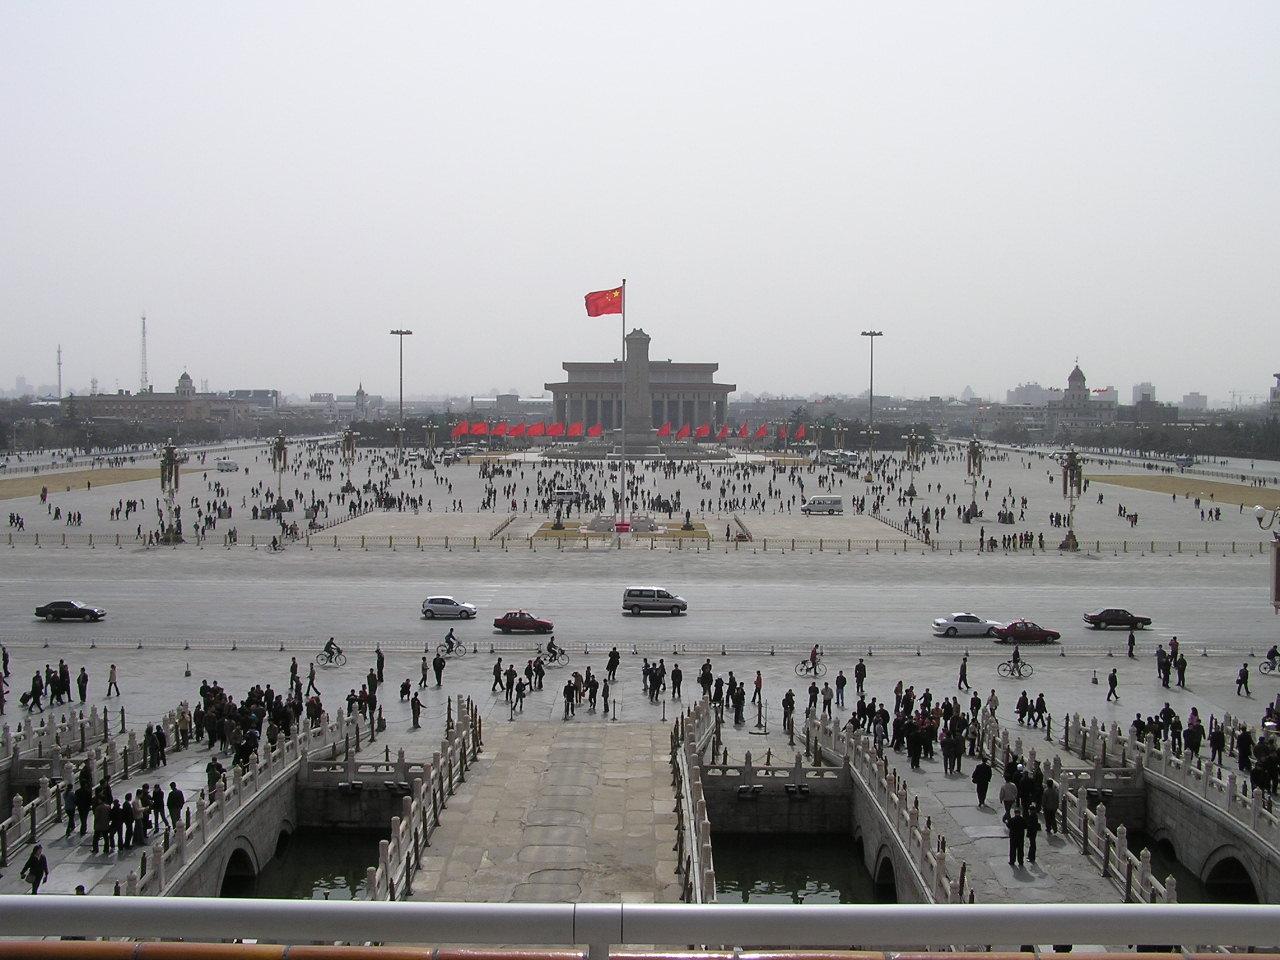 http://treasuretroveblog.com/wp-content/uploads/2010/12/Tiananmen_Square.jpg